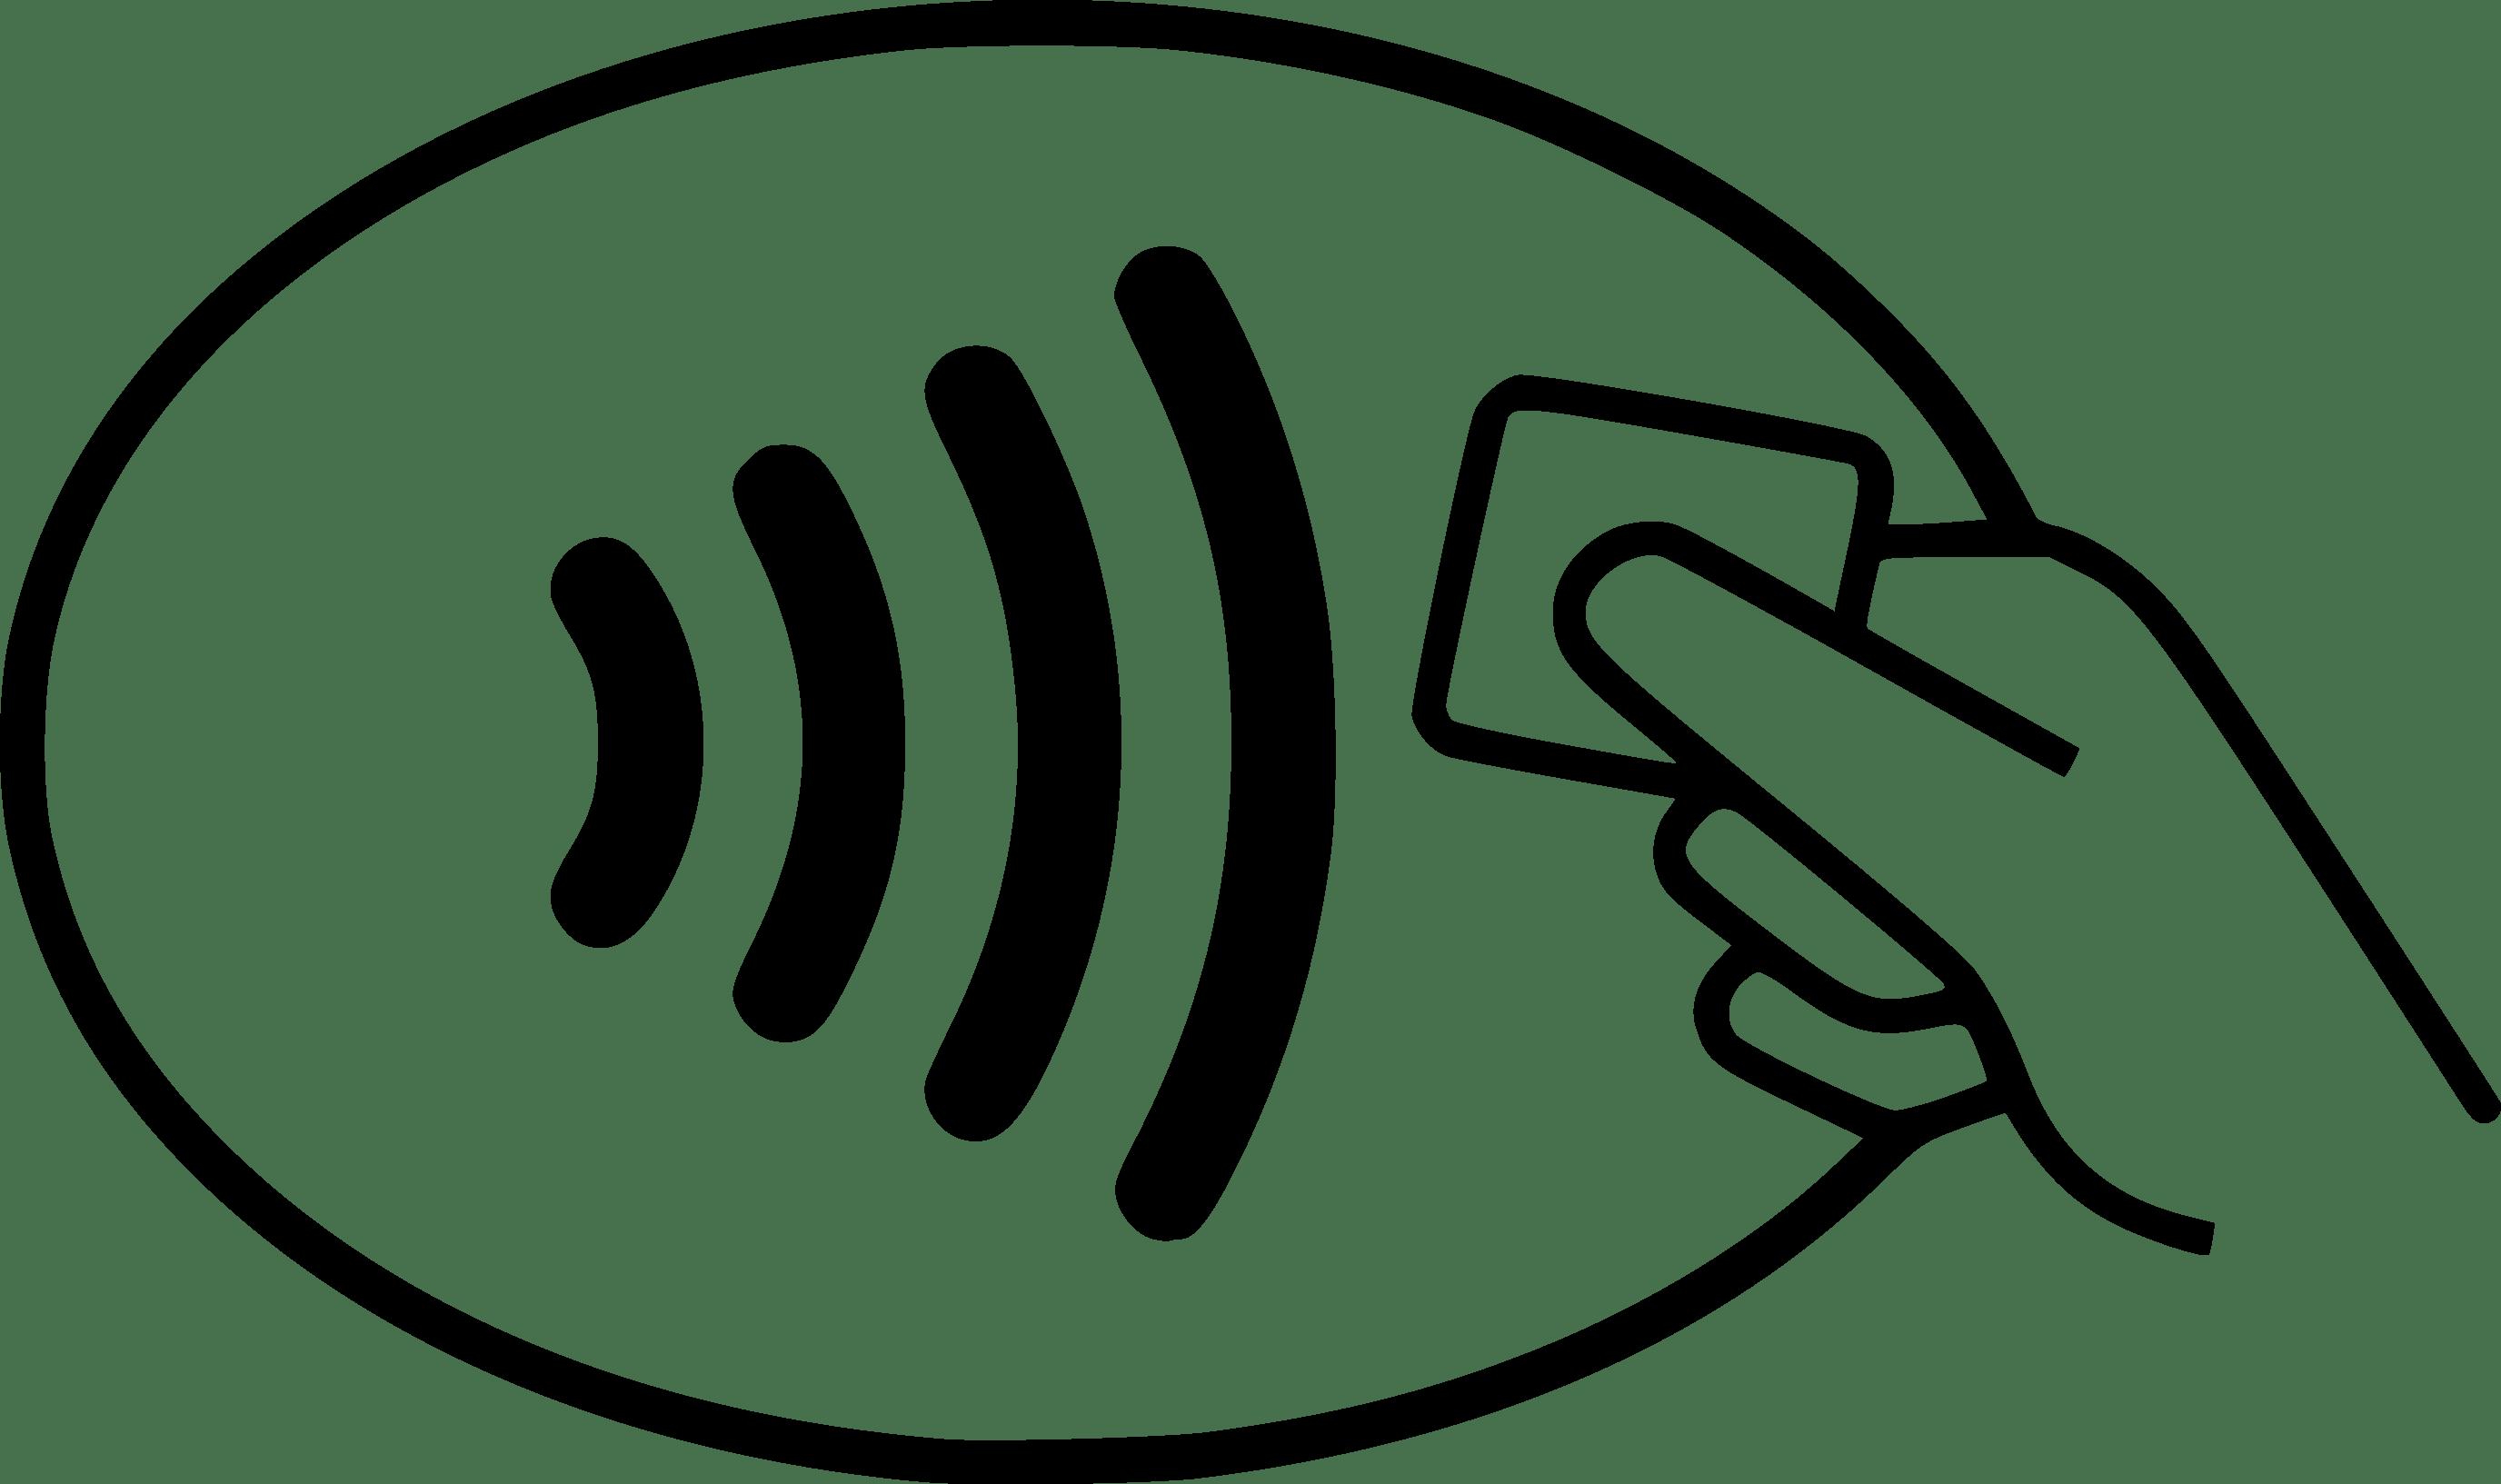 contactless-pay-symbol